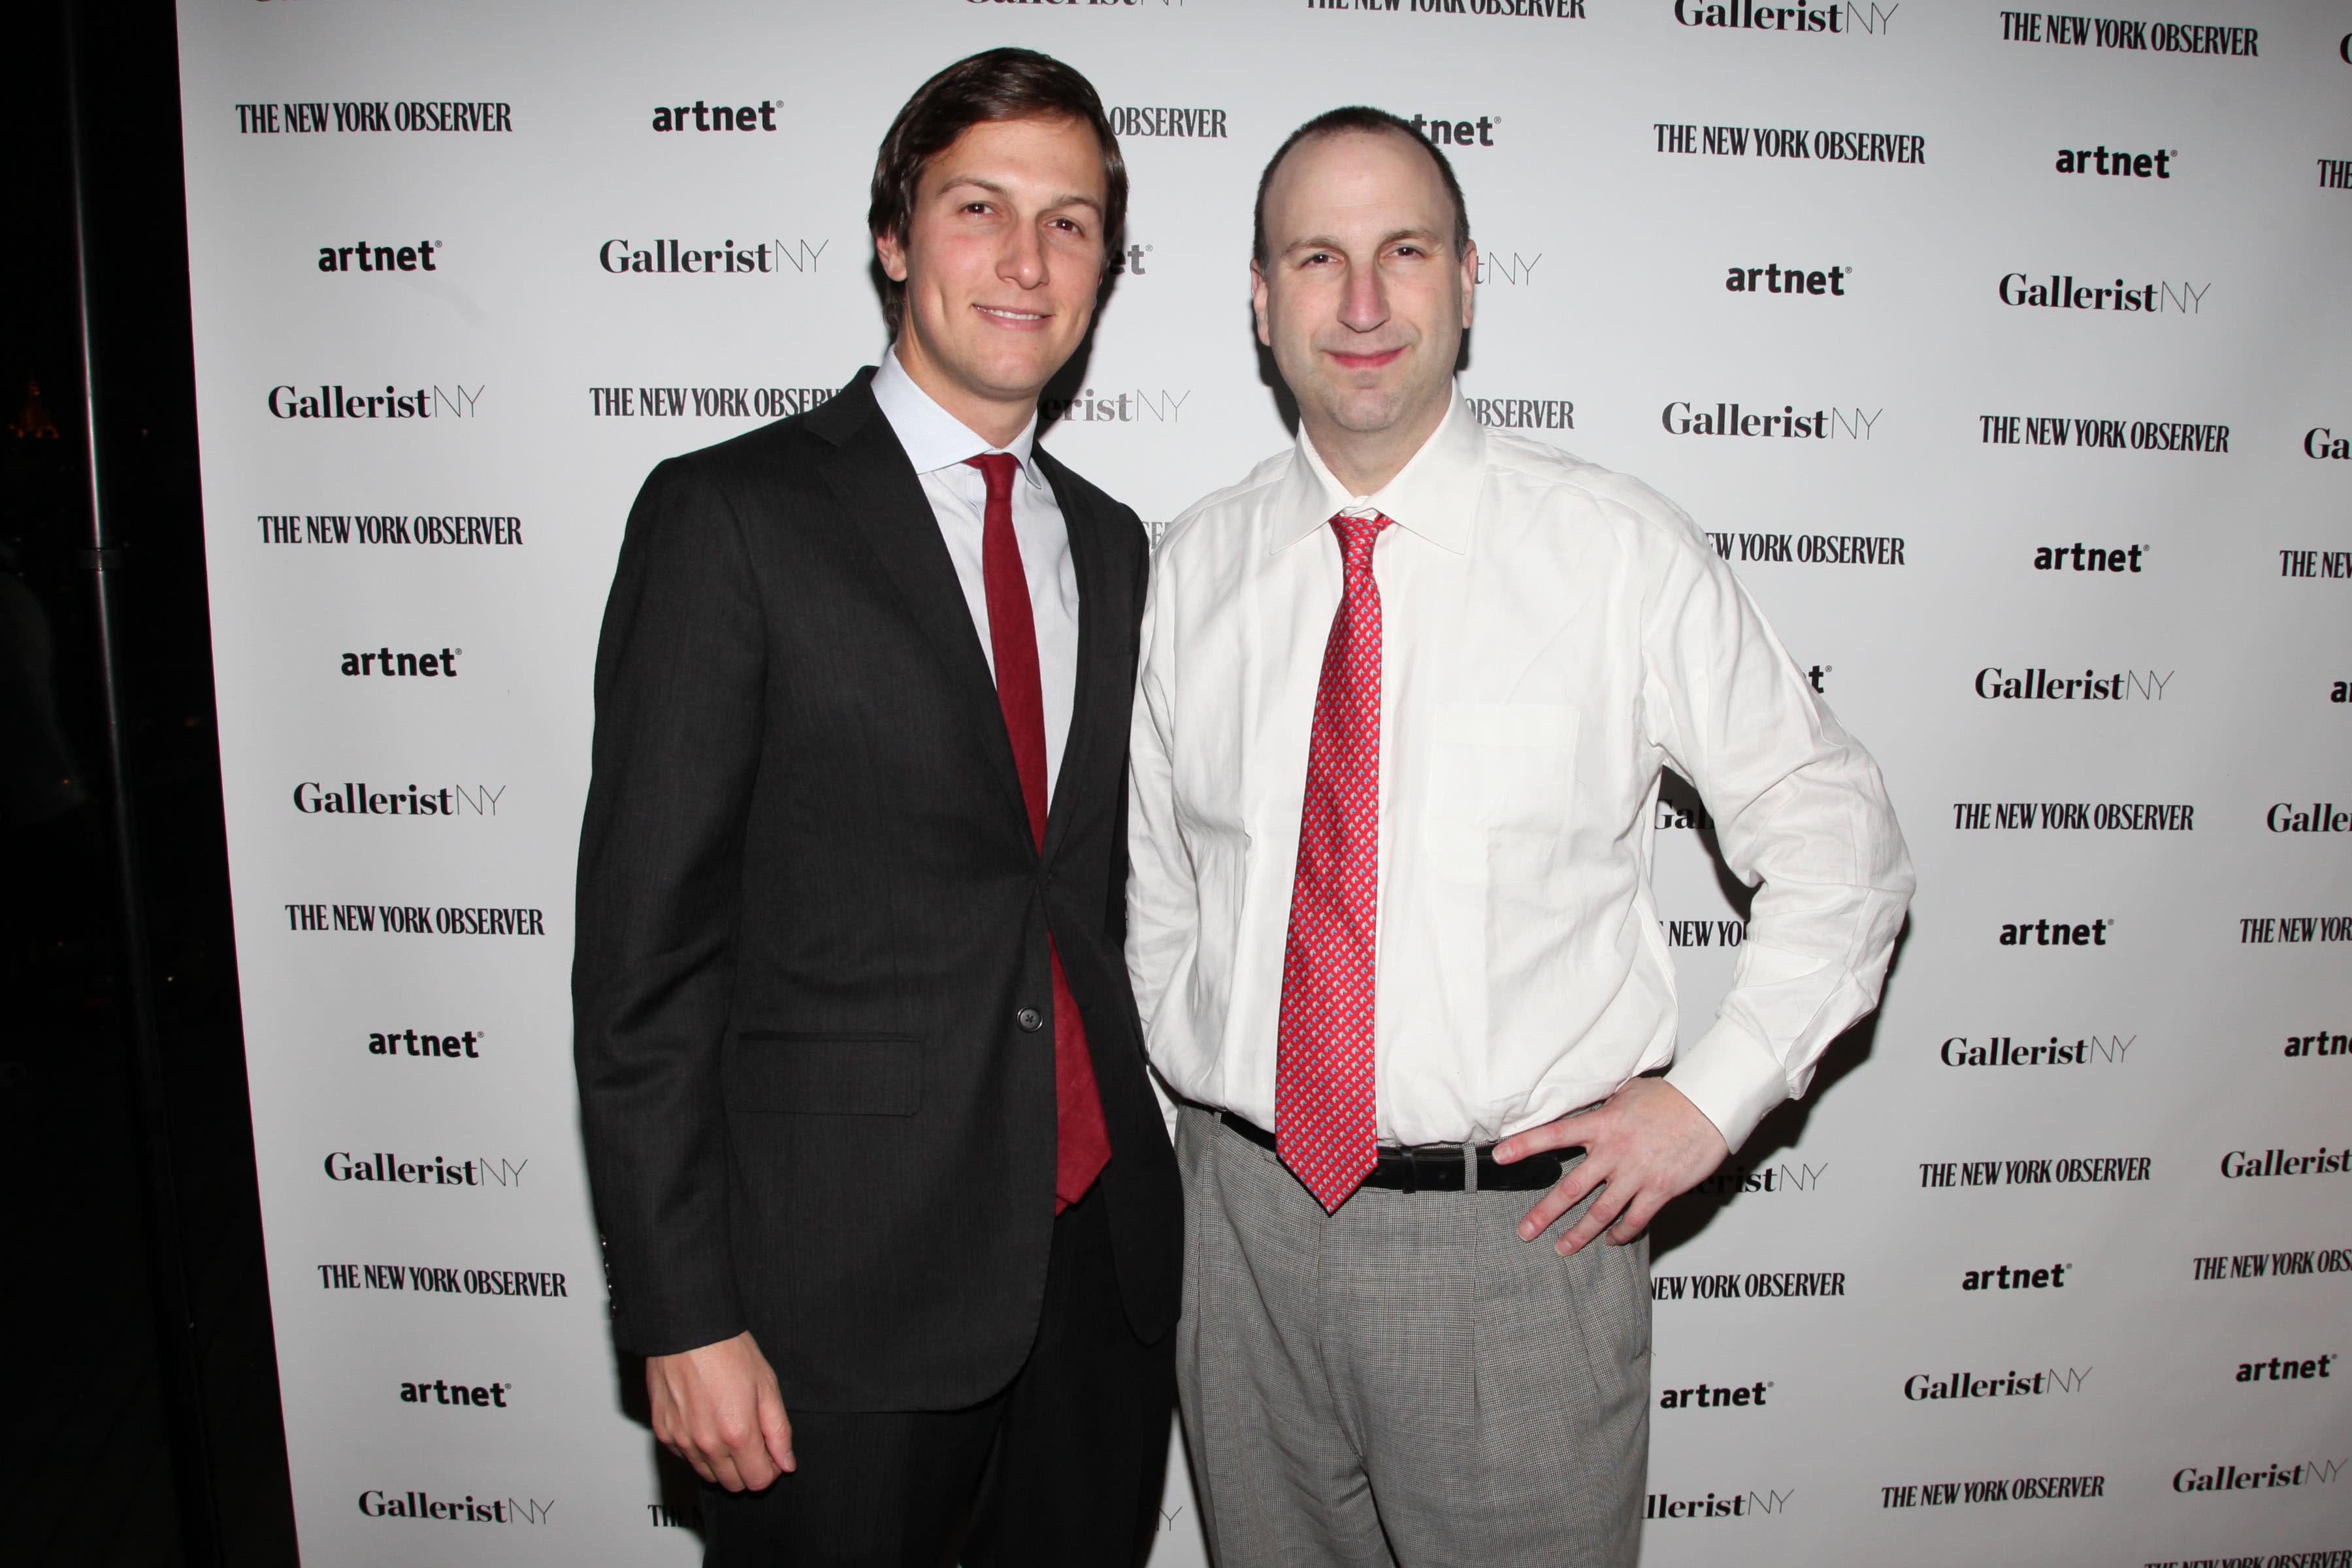 Jared Kushner friend, Giuliani associate Ken Kurson charged with cyber stalking thumbnail